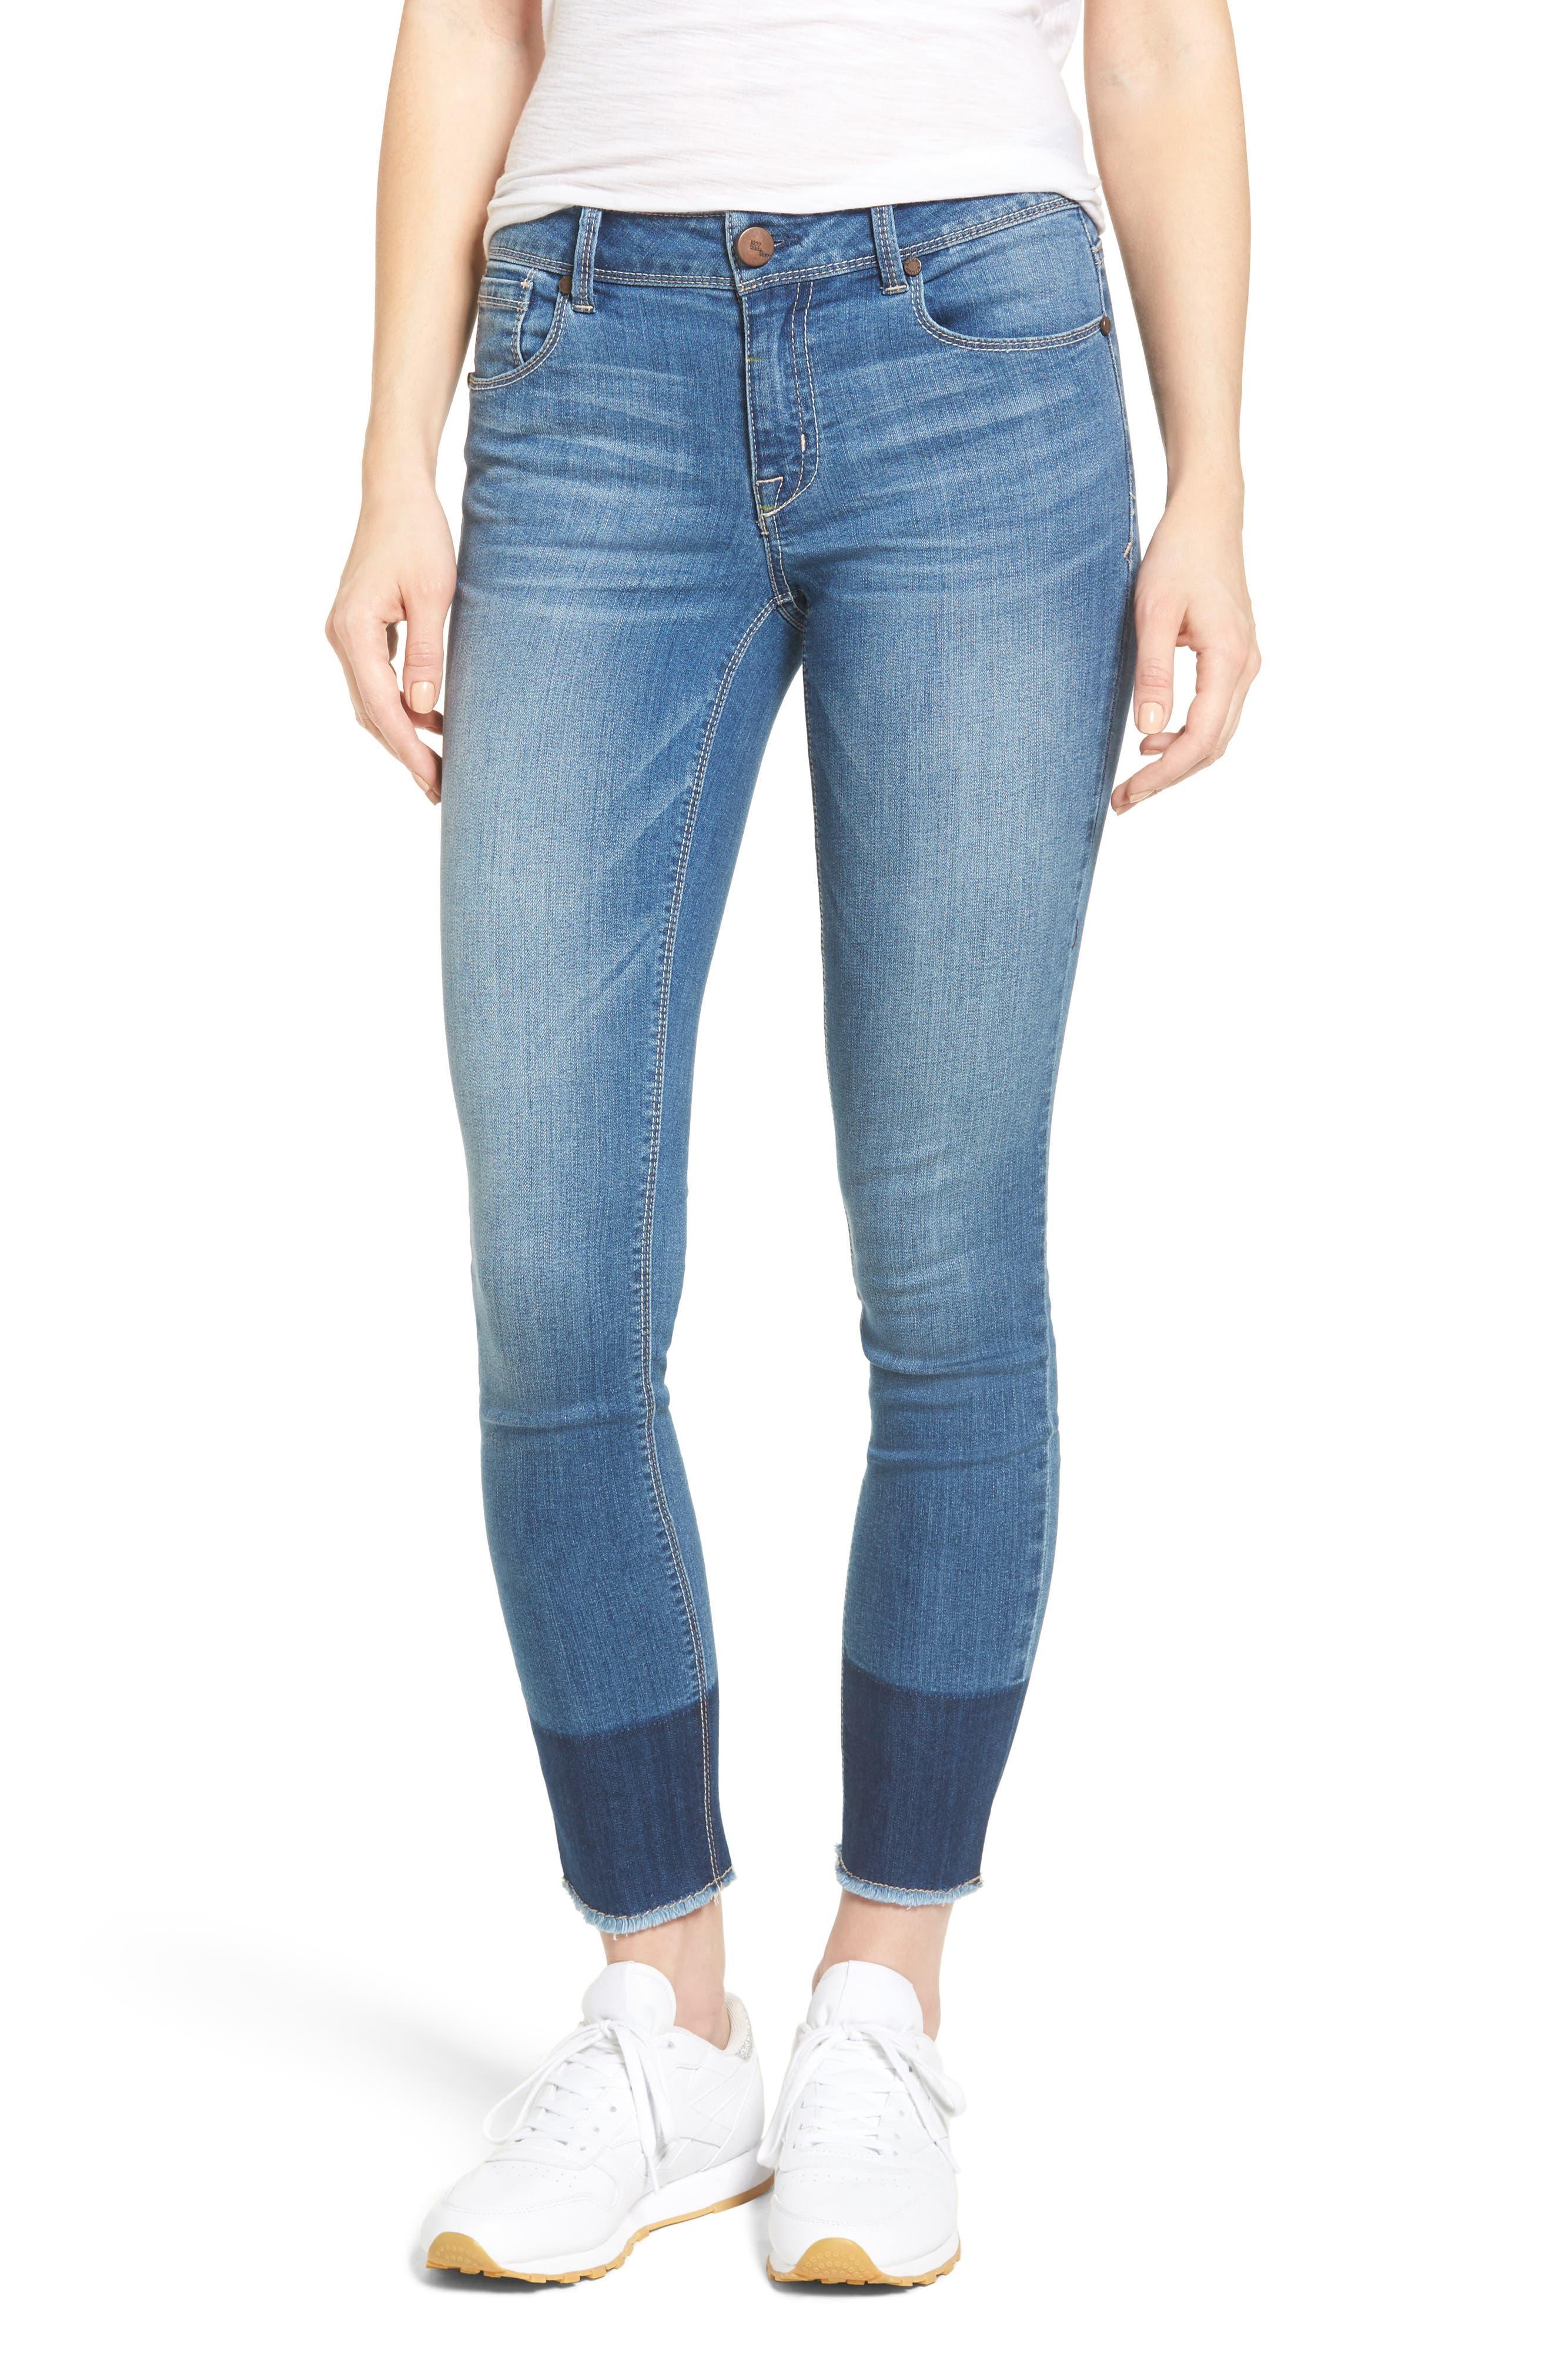 1822 Denim Two-Tone Skinny Jeans (Lexington)